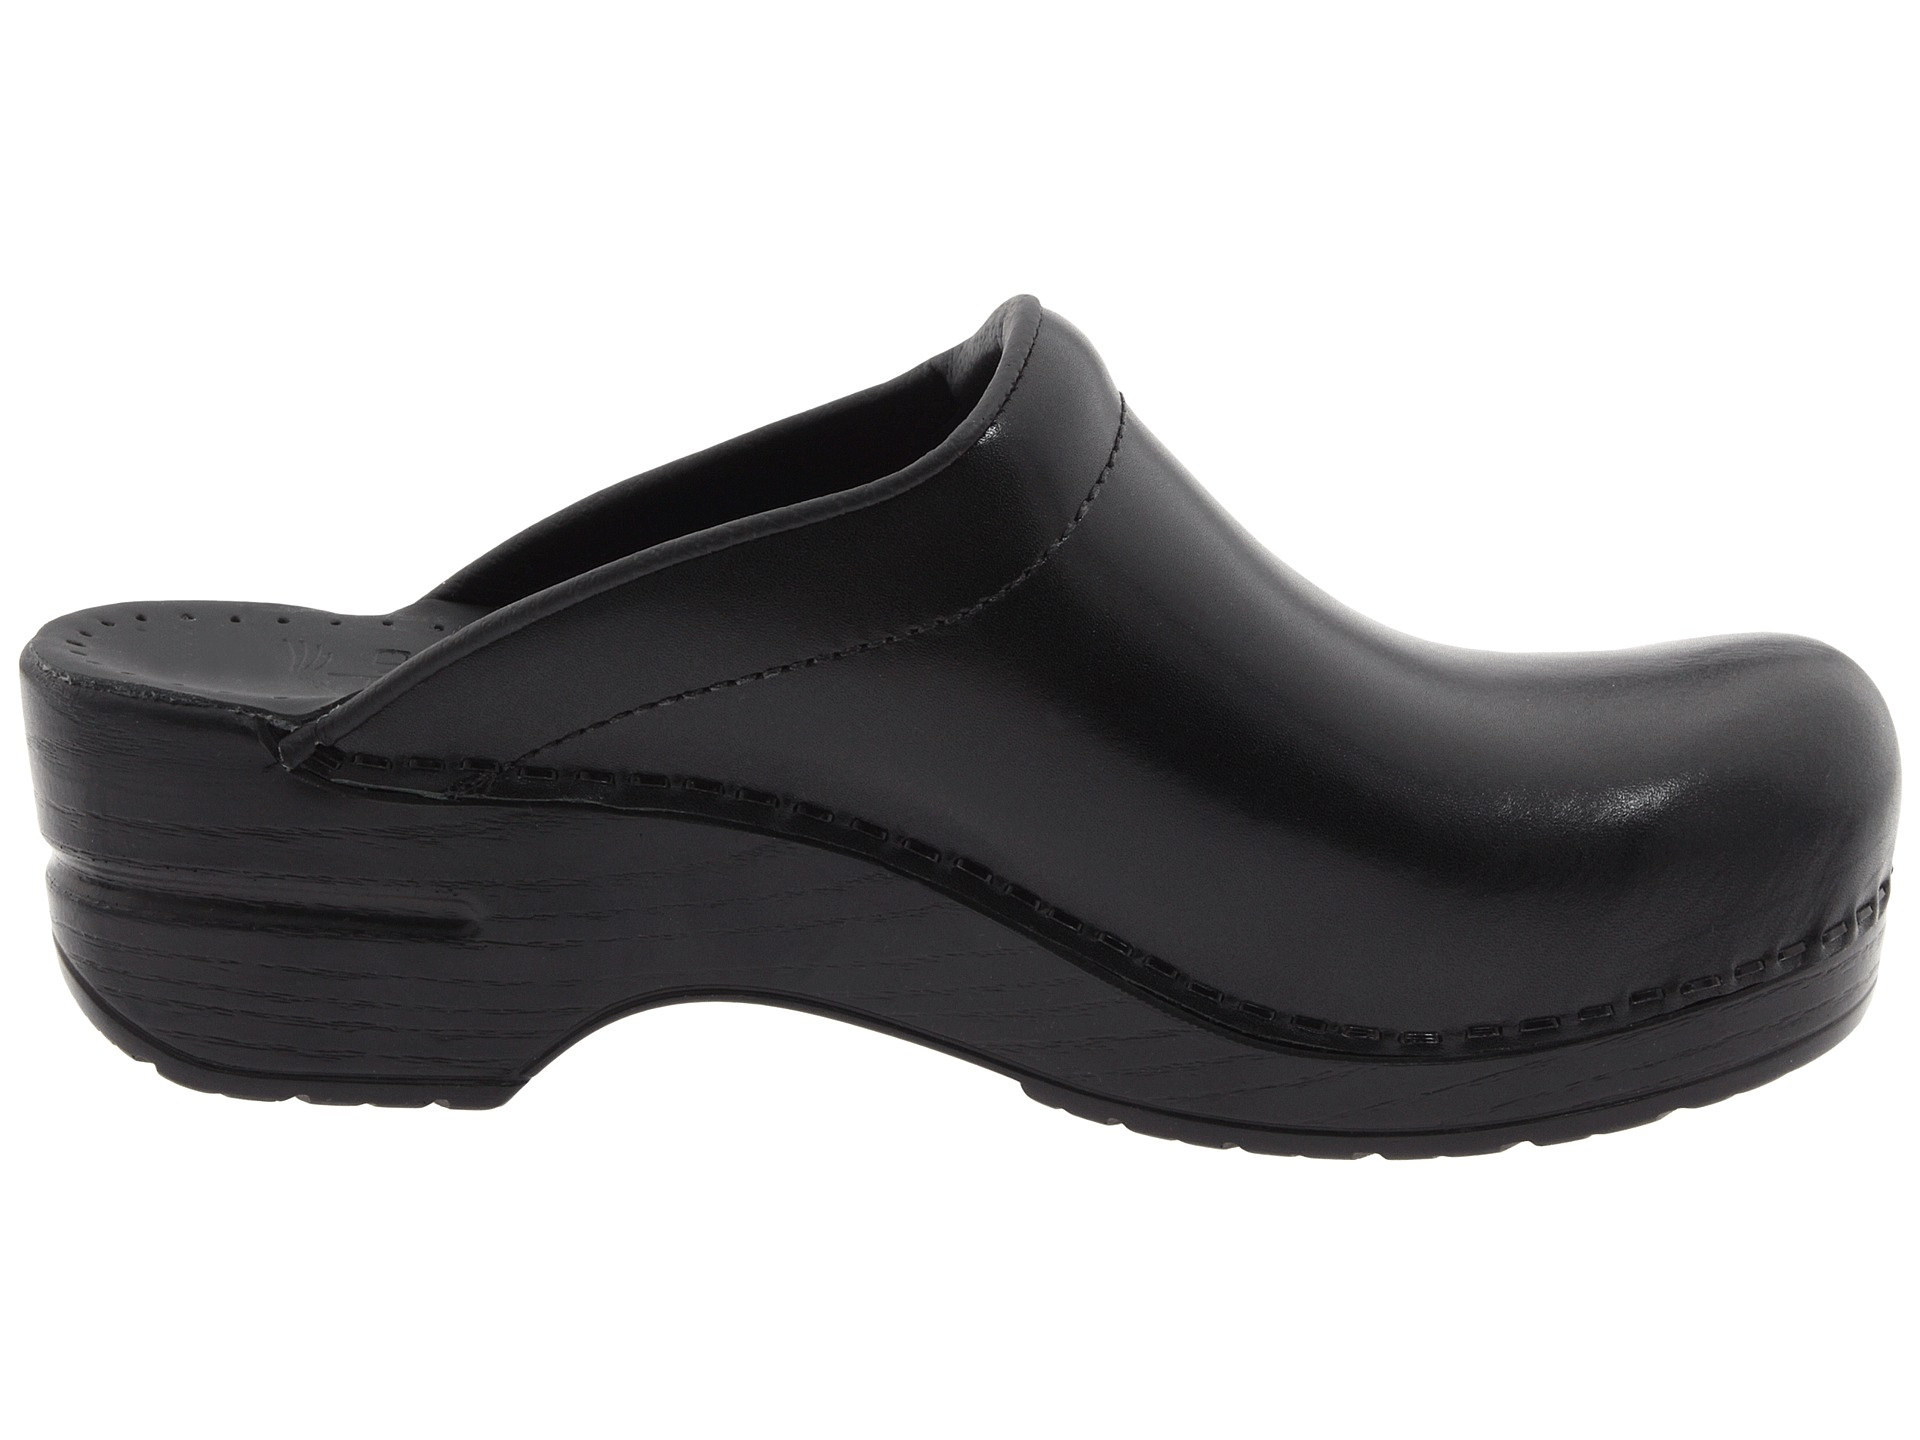 Nursing Shoes Black Friday Sale